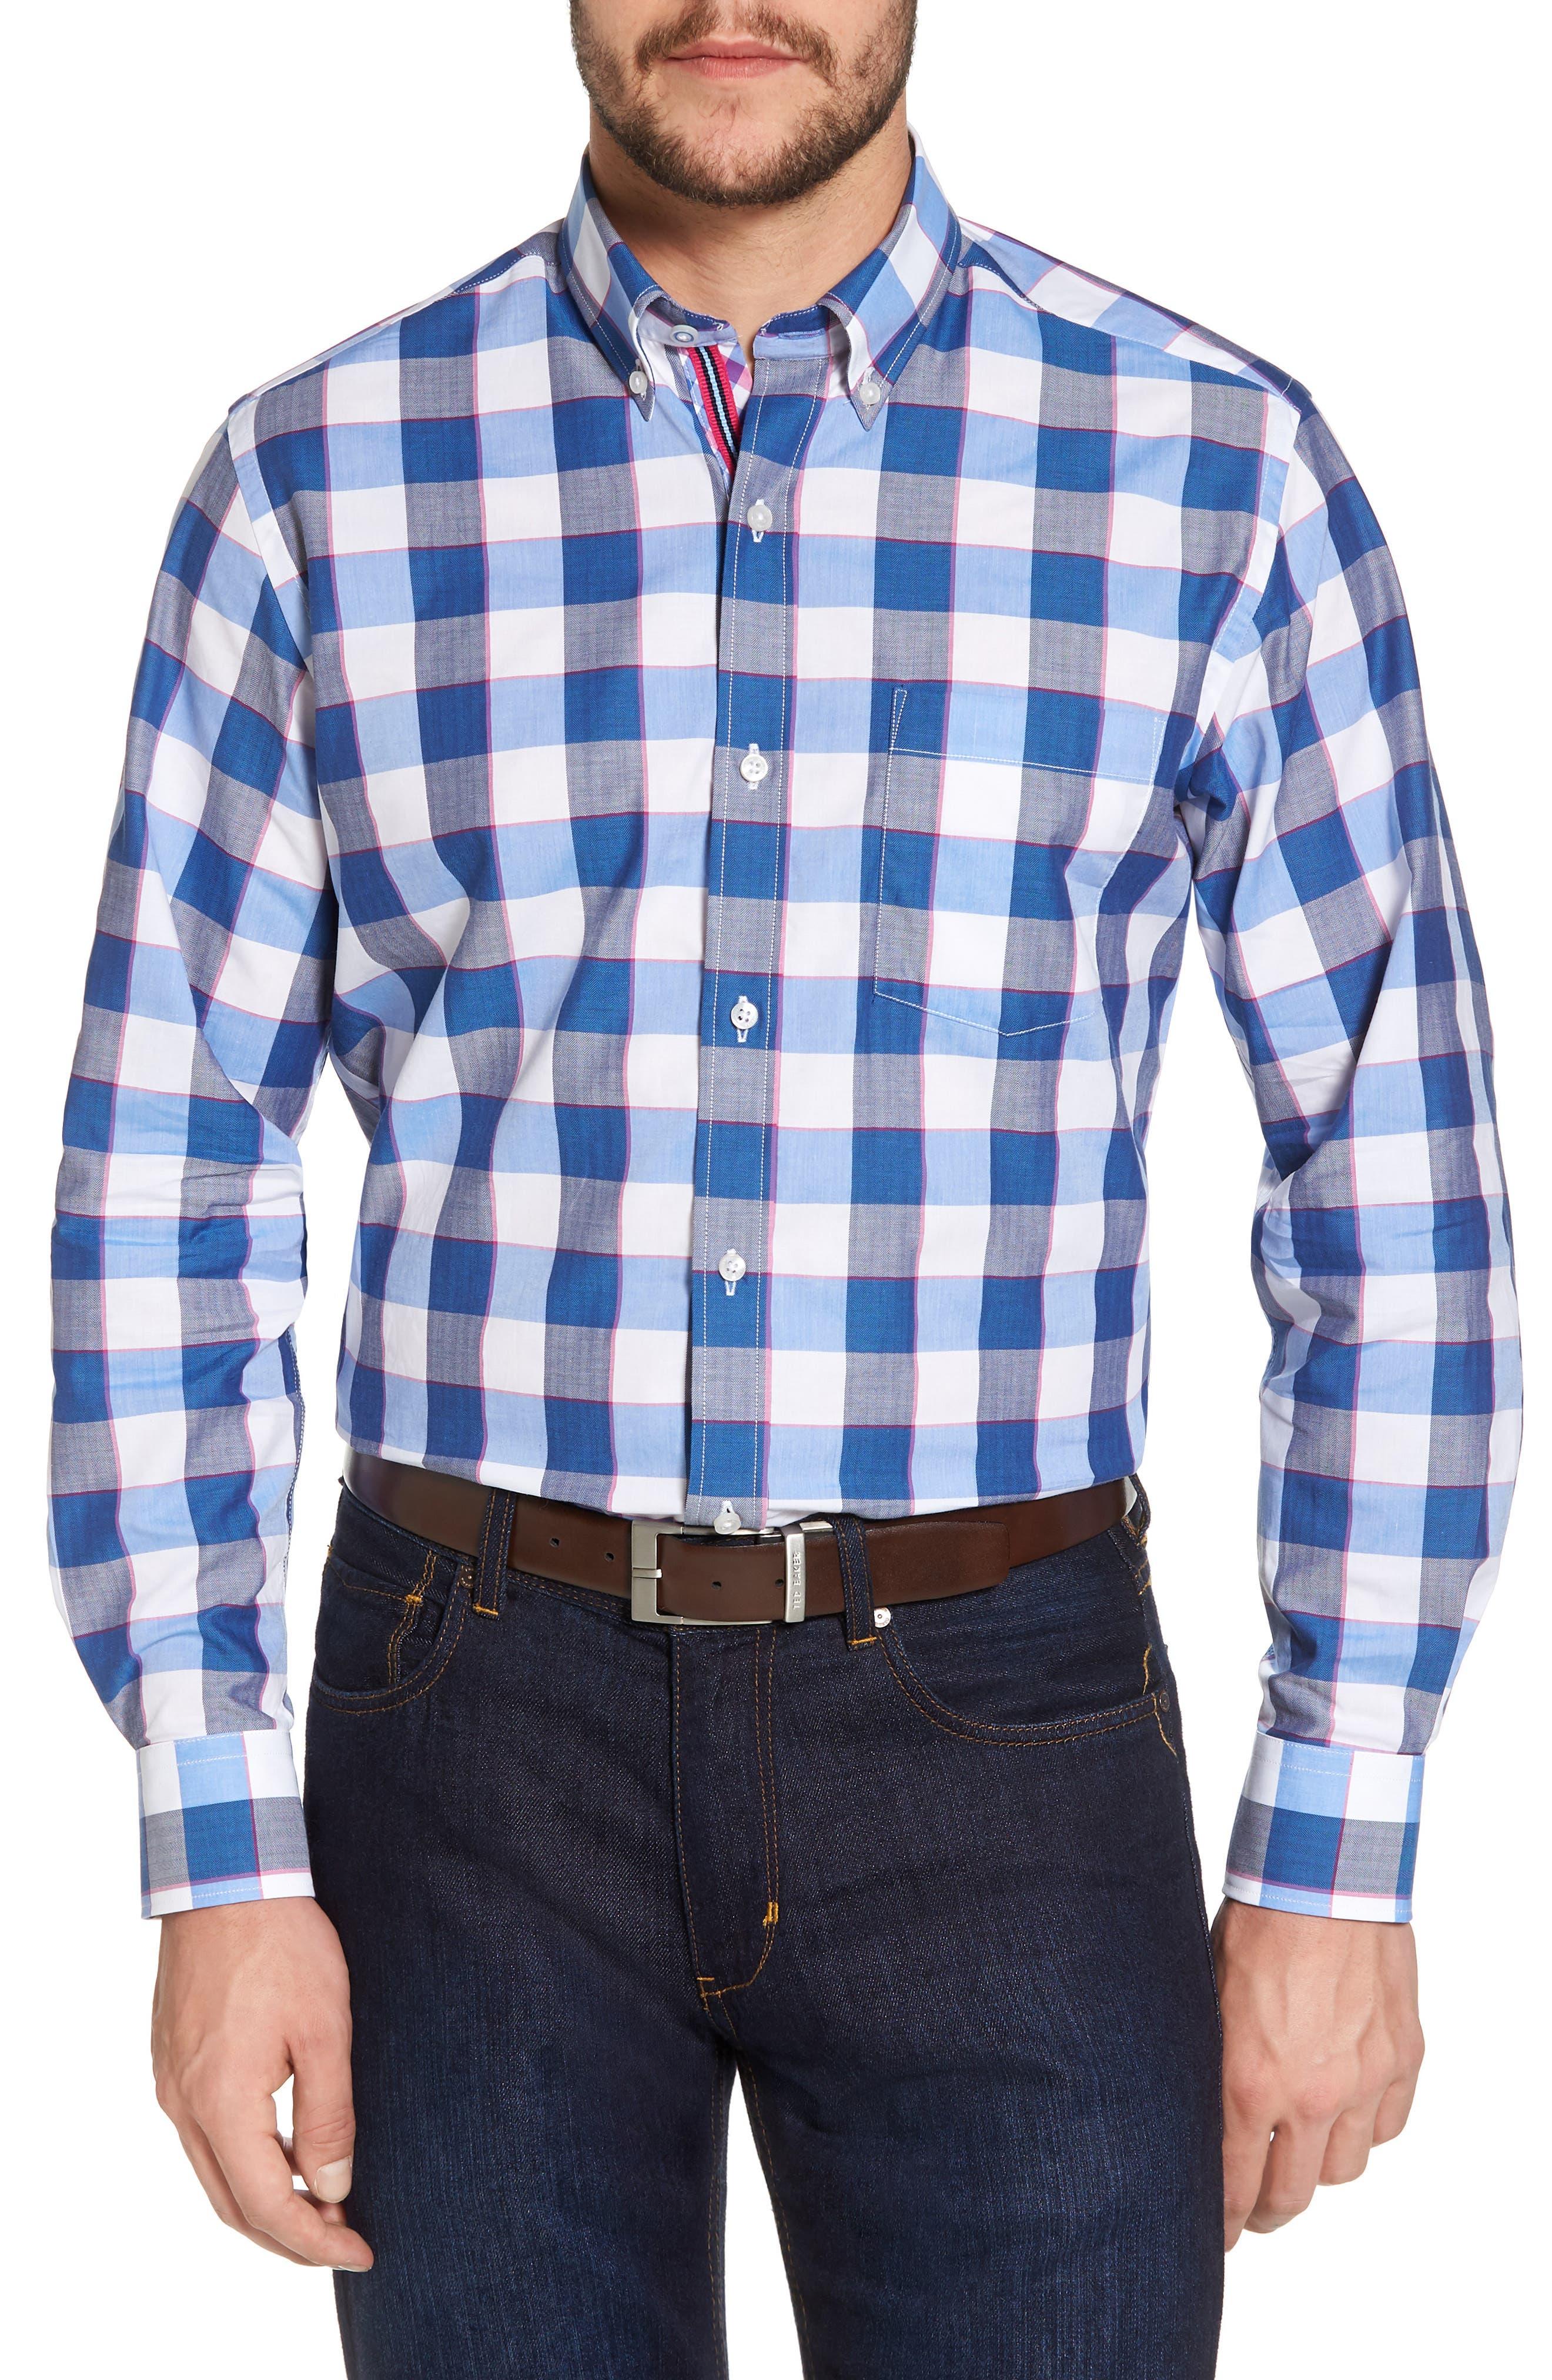 Jeremy Regular Fit Check Sport Shirt,                             Main thumbnail 1, color,                             Navy